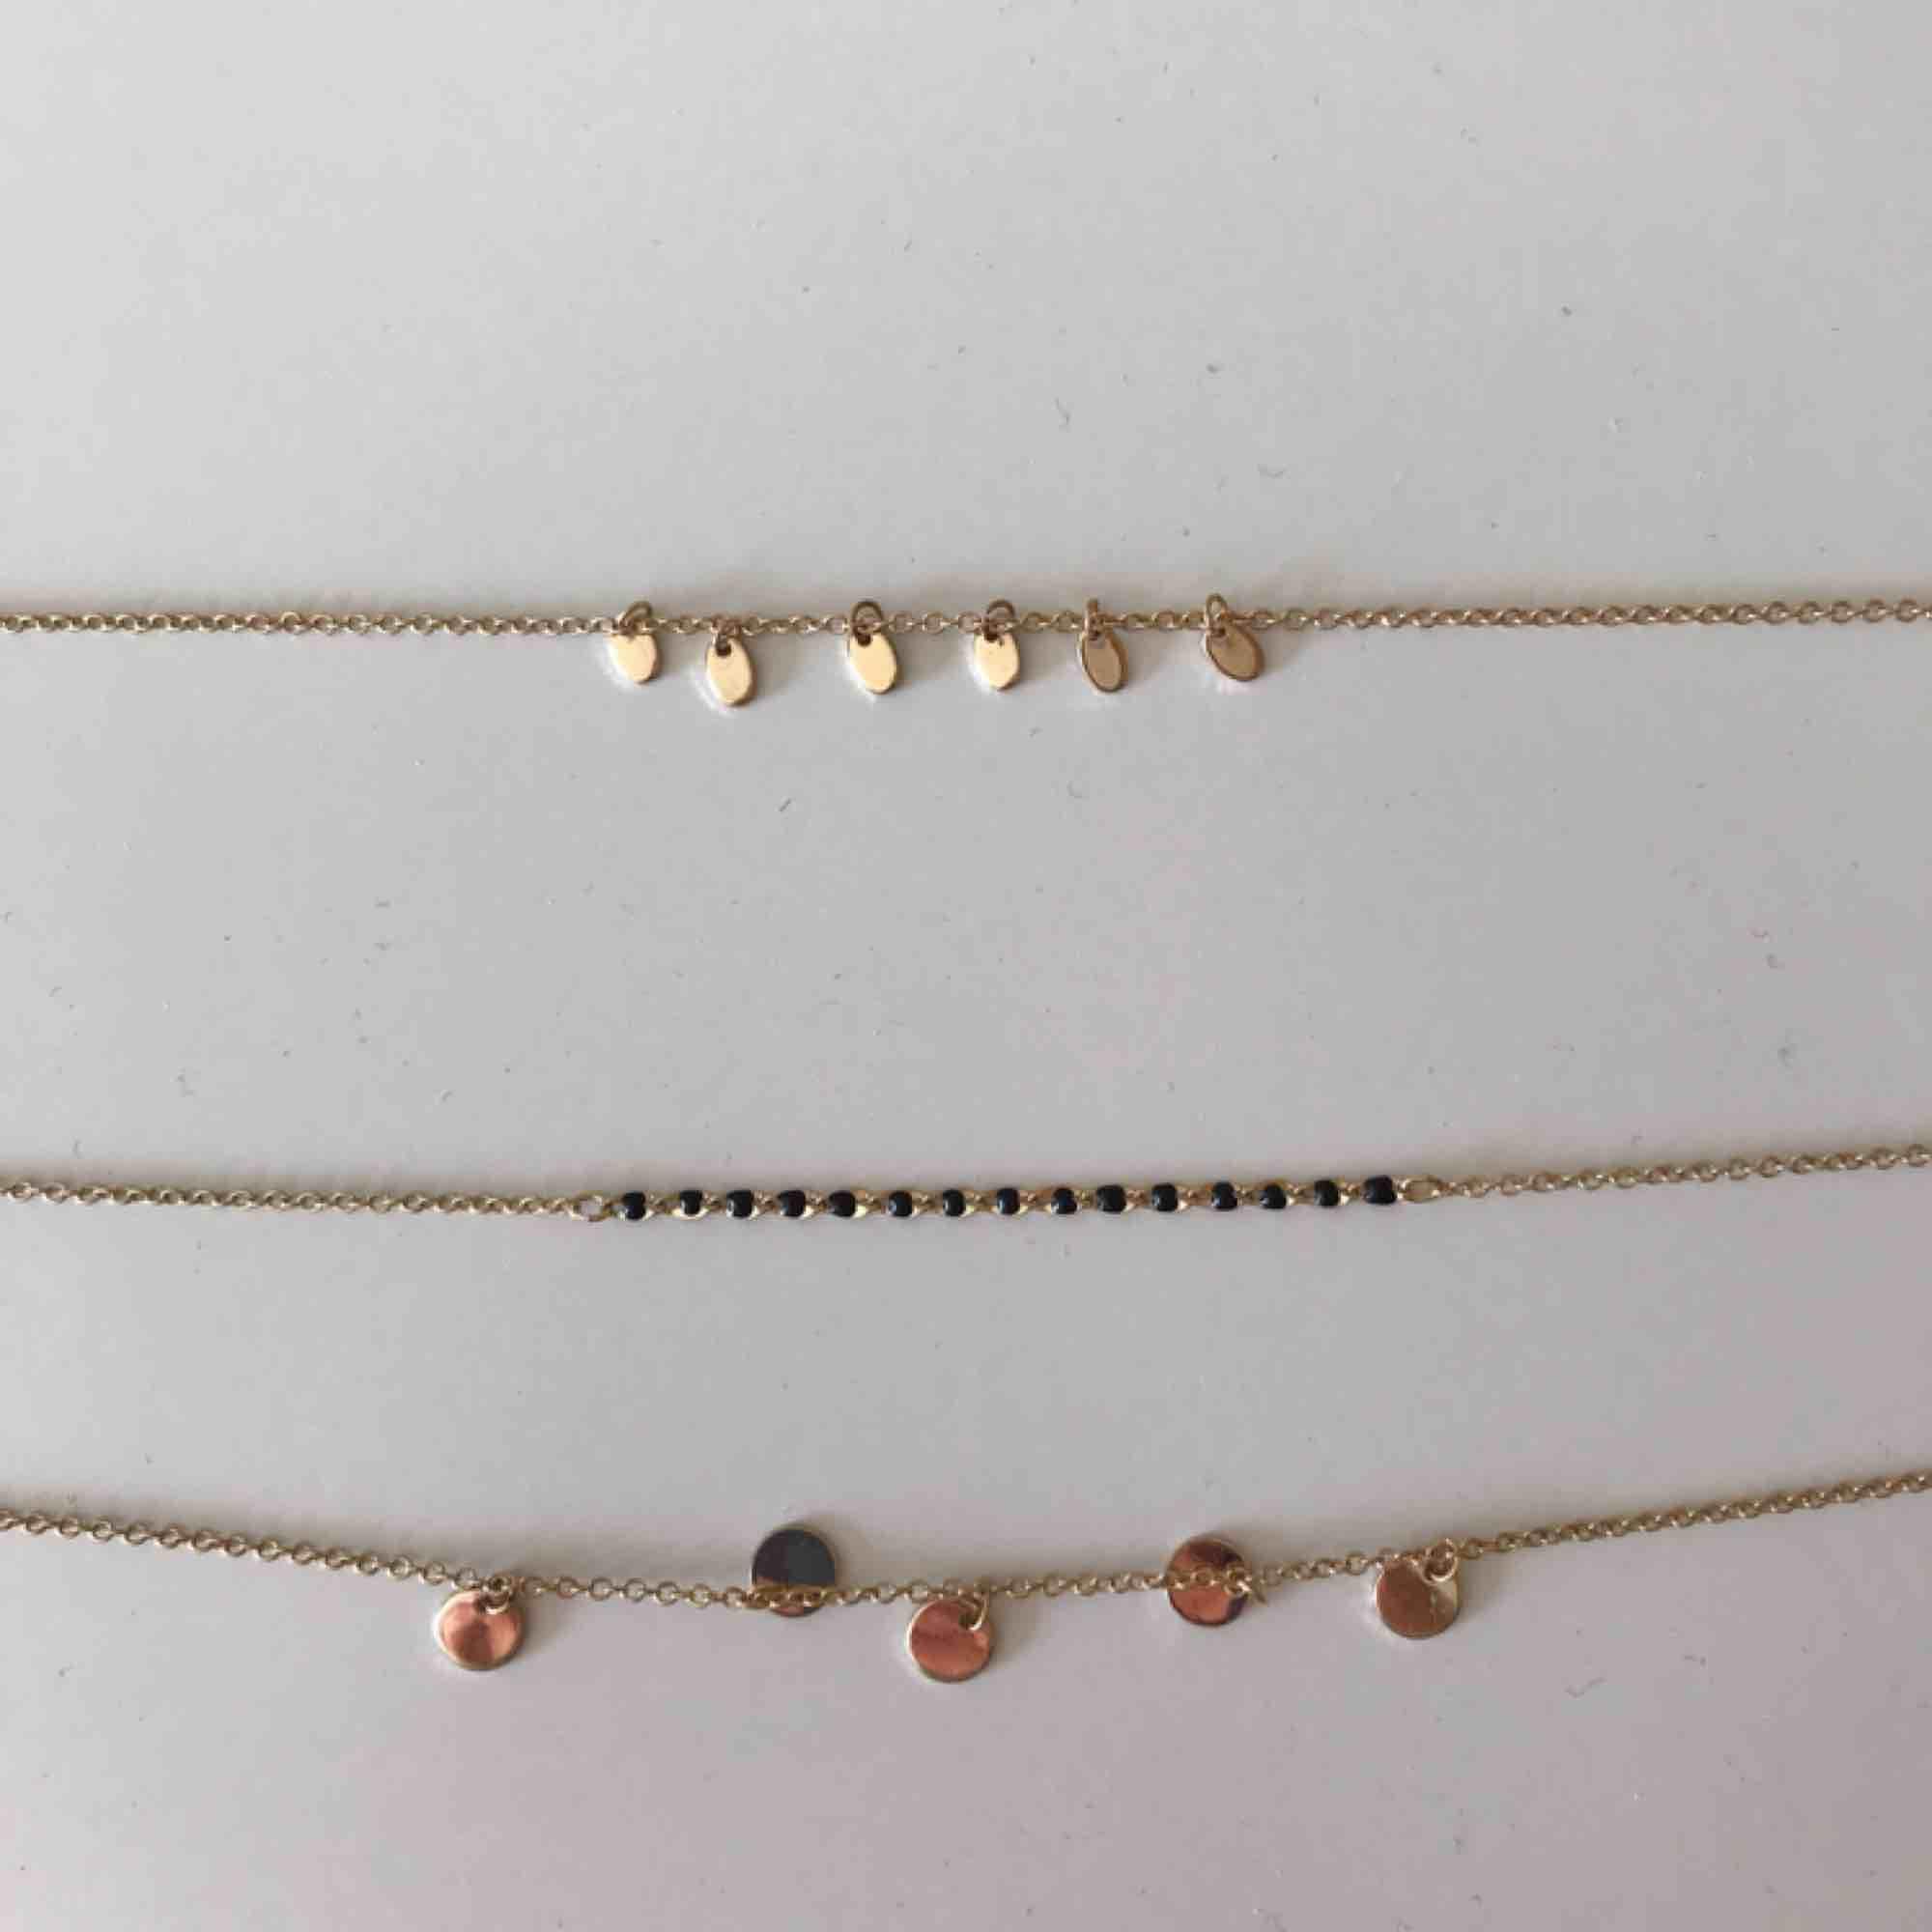 Guldfärgat halsband  Frakt:15kr . Accessoarer.